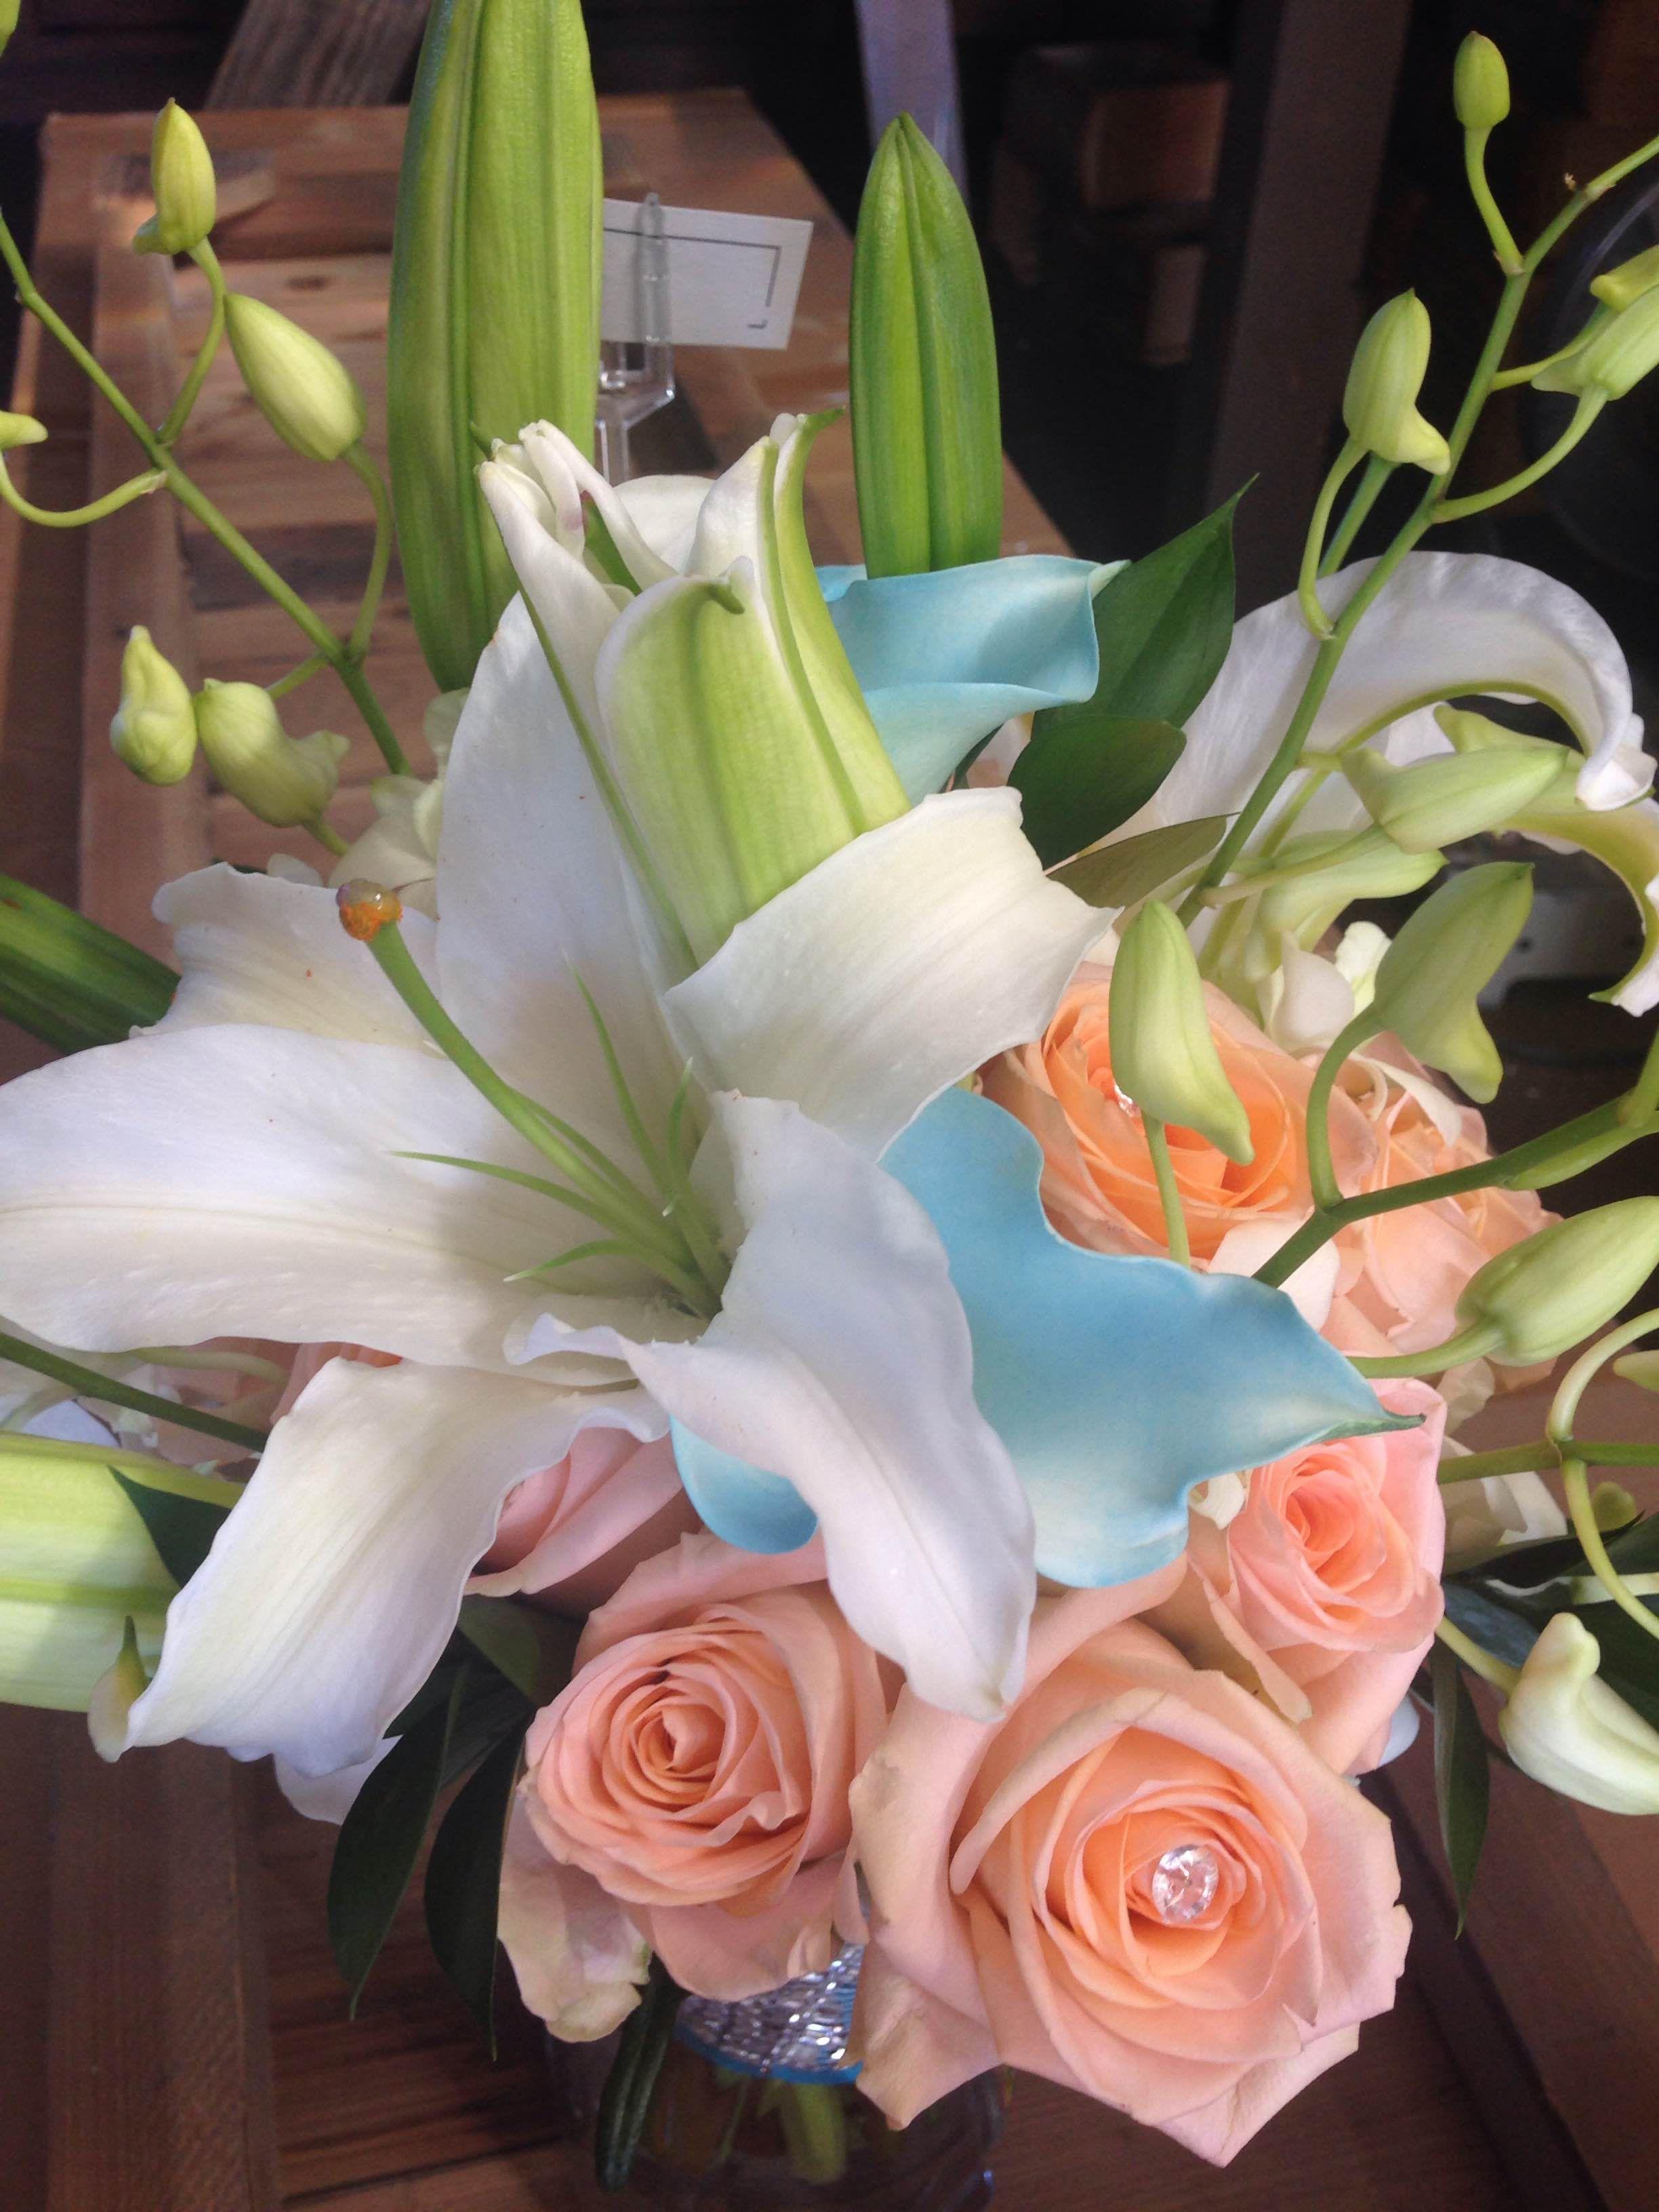 Bellafloralpa Theartoflivingbeautifully Prom2015 Prom Flowers Prom 2015 Flowers